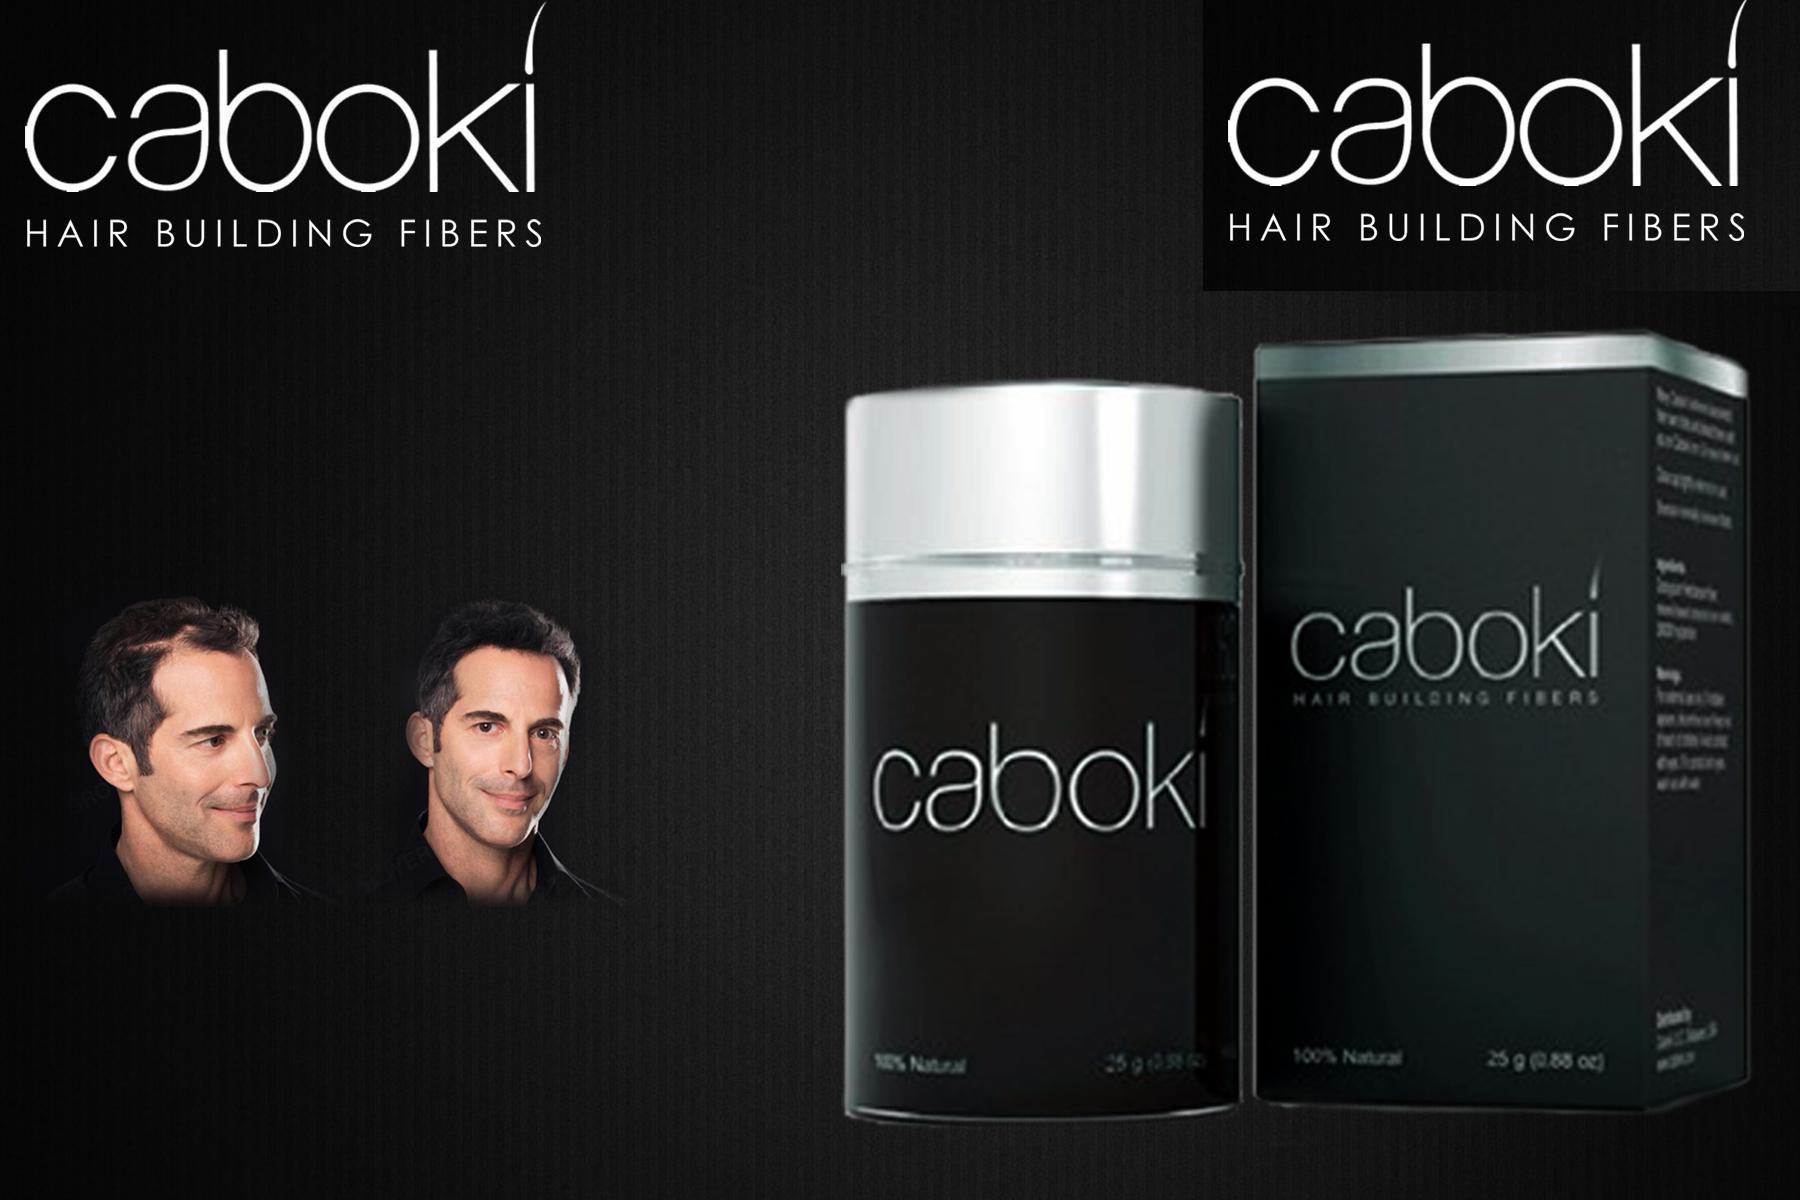 Caboki Hair Loss Concealer Building Fiber - 25g Usa Black: Buy Online at  Best Prices in Pakistan | Daraz.pk